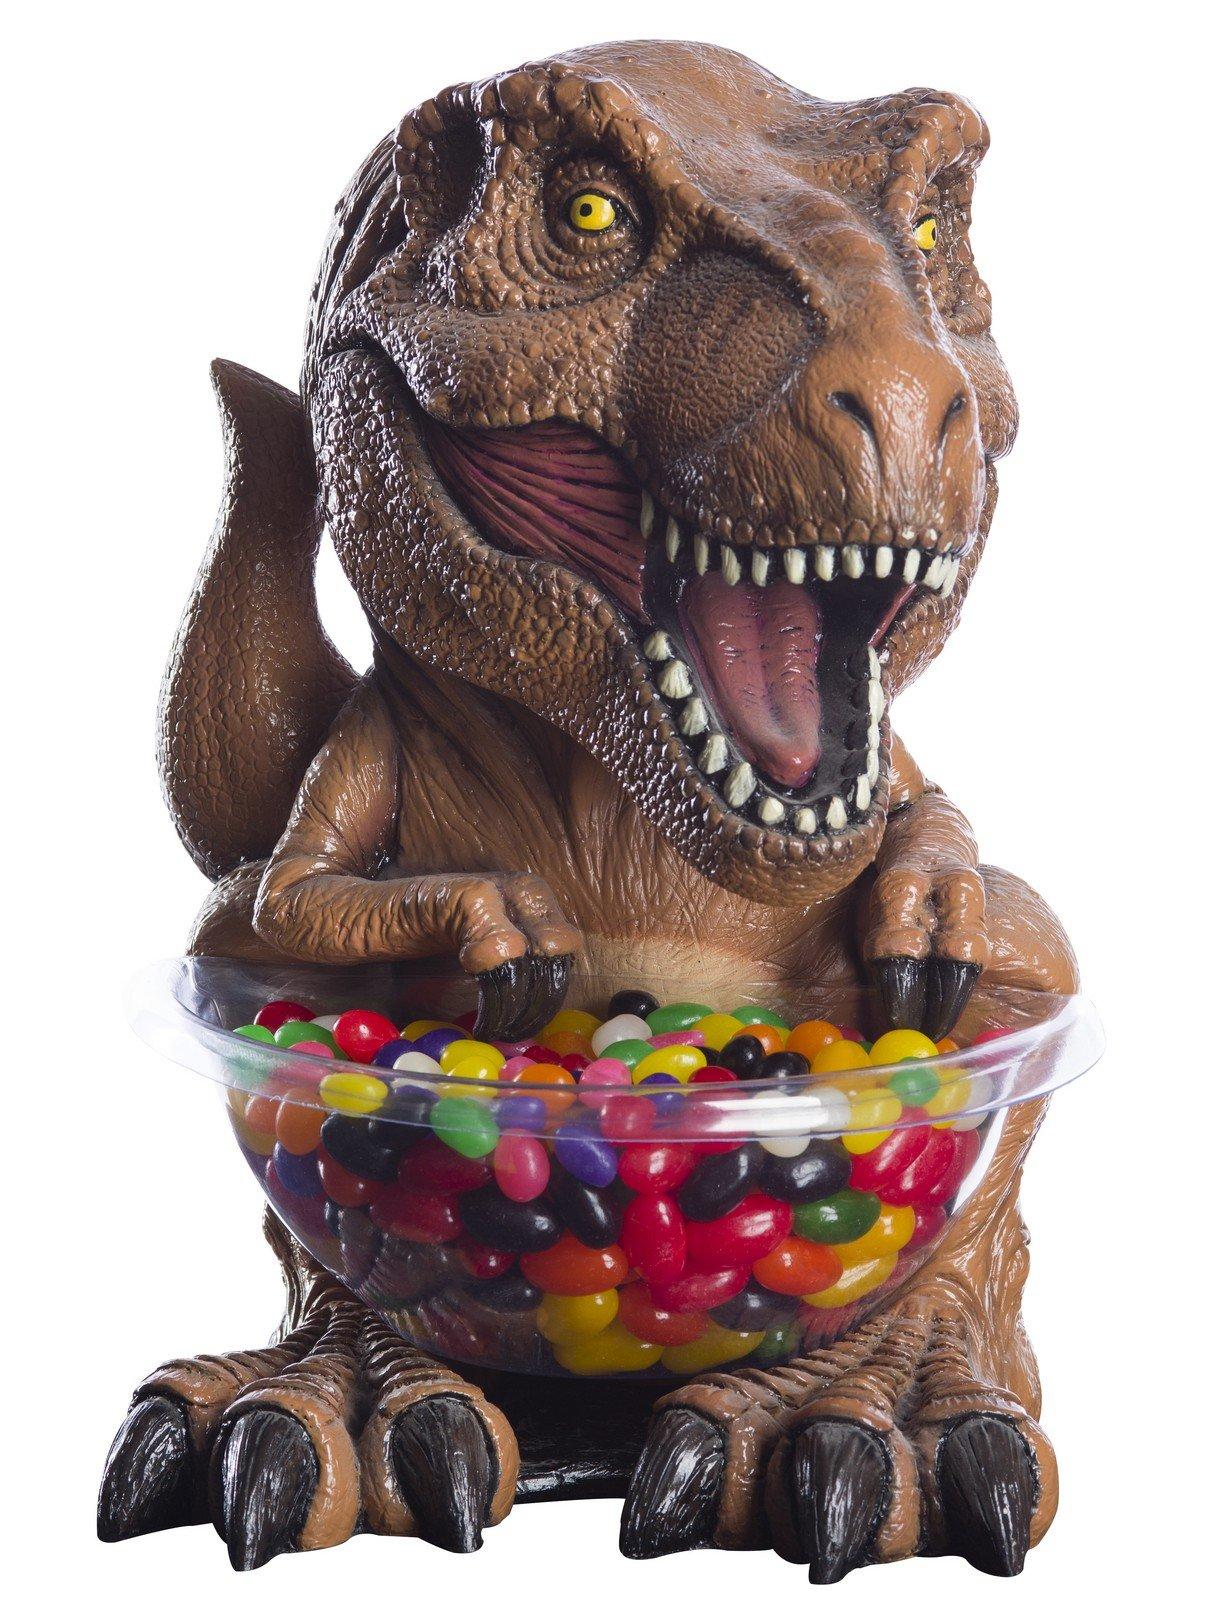 Rubie's 69067 Jurassic World: Fallen Kingdom Candy Bowl Holder, Small, T-Rex